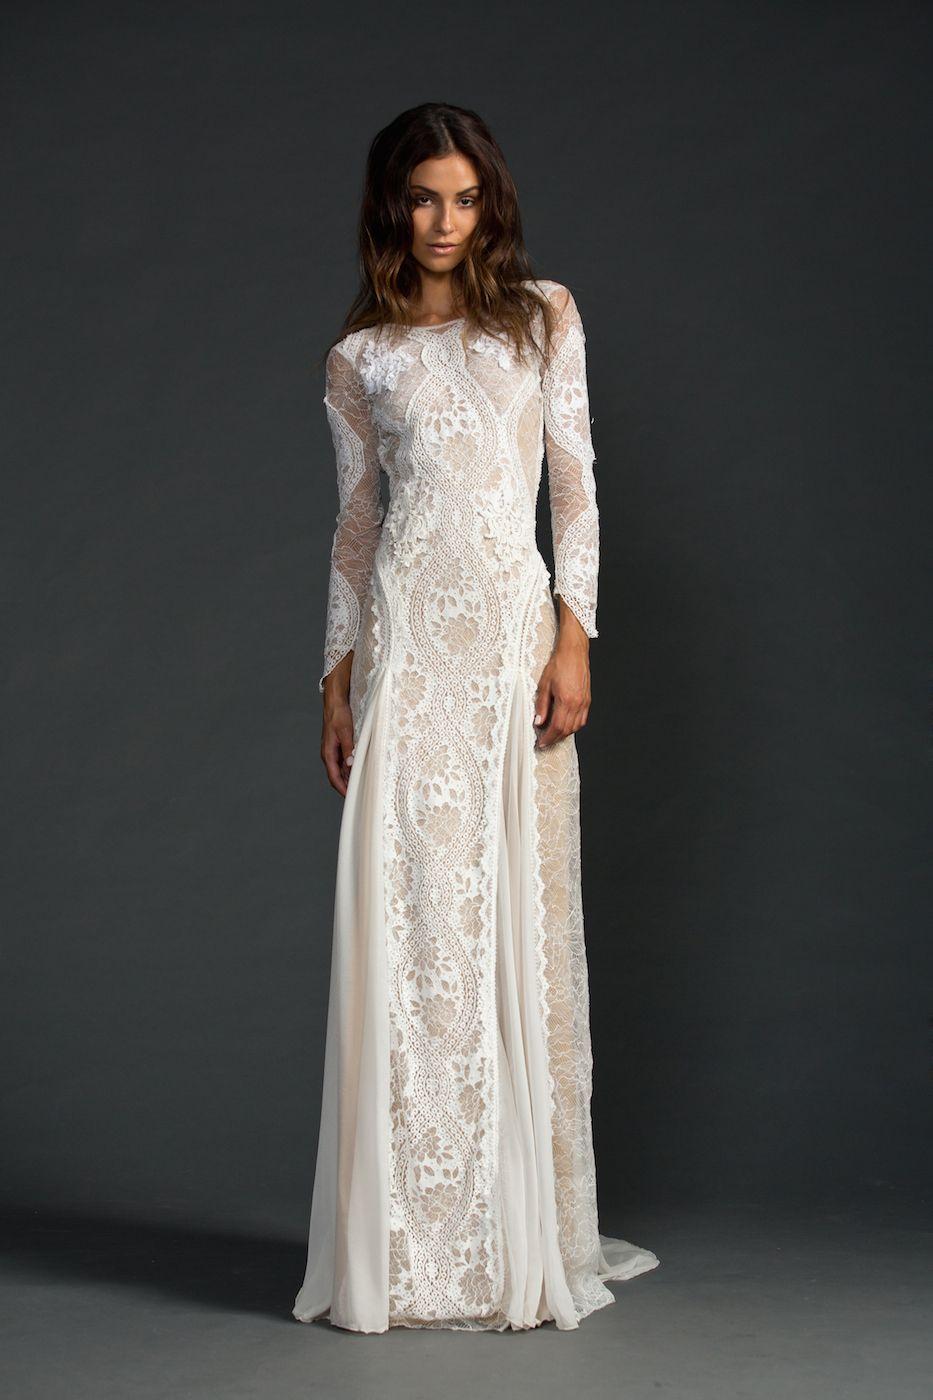 Vestido de noiva estilo Boho chic Pinterest Lace wedding dresses